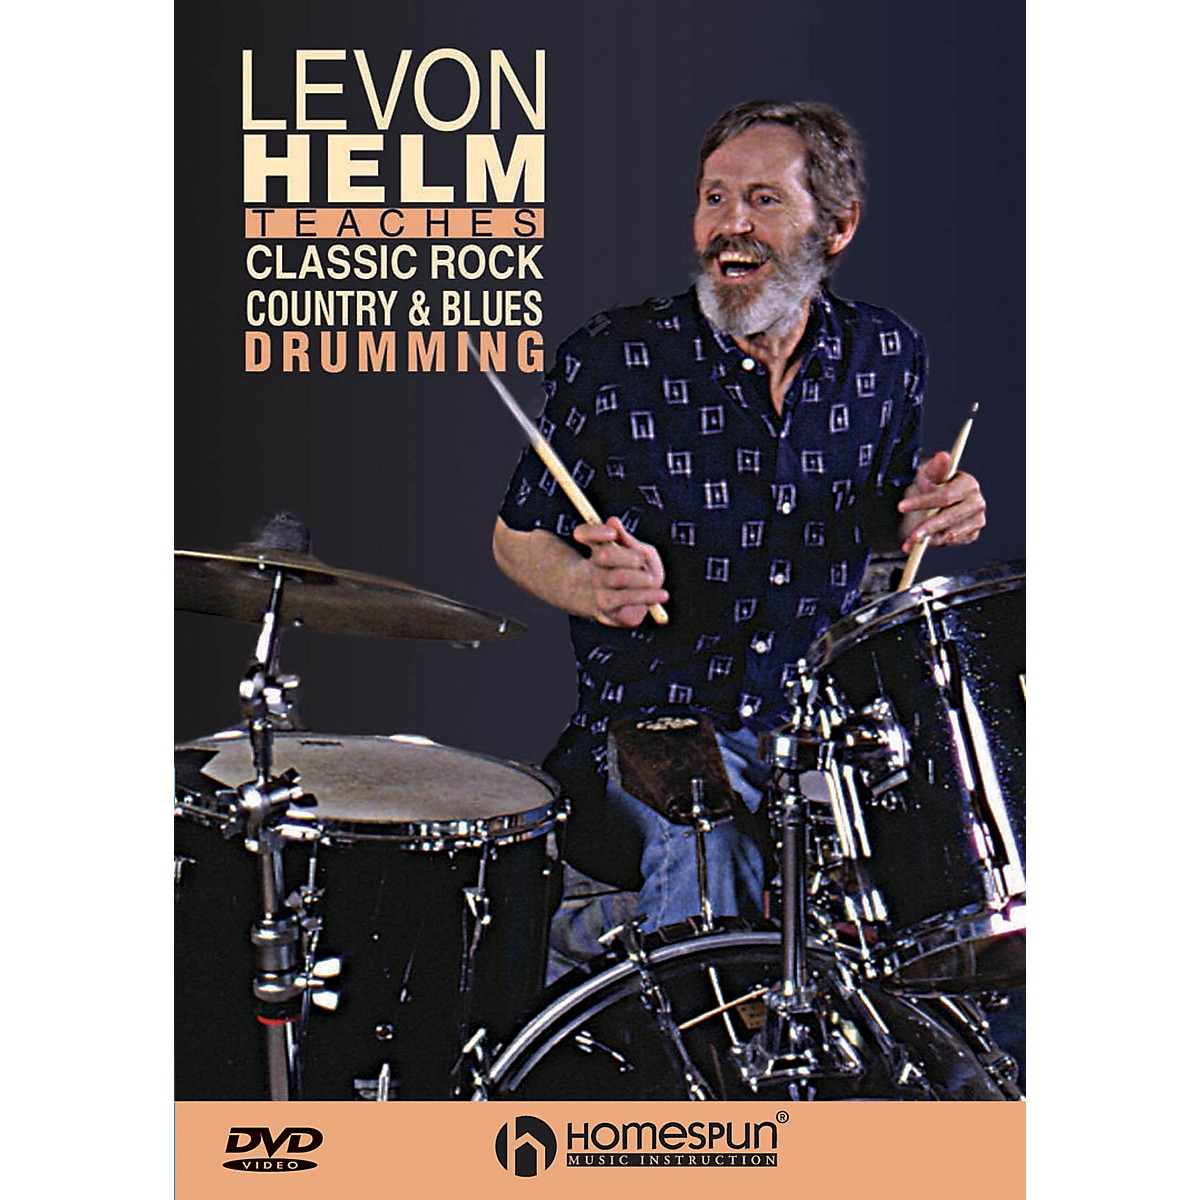 Homespun Classic Rock, Country & Blues Drumming Instructional/Drum/DVD Series DVD Written by Levon Helm